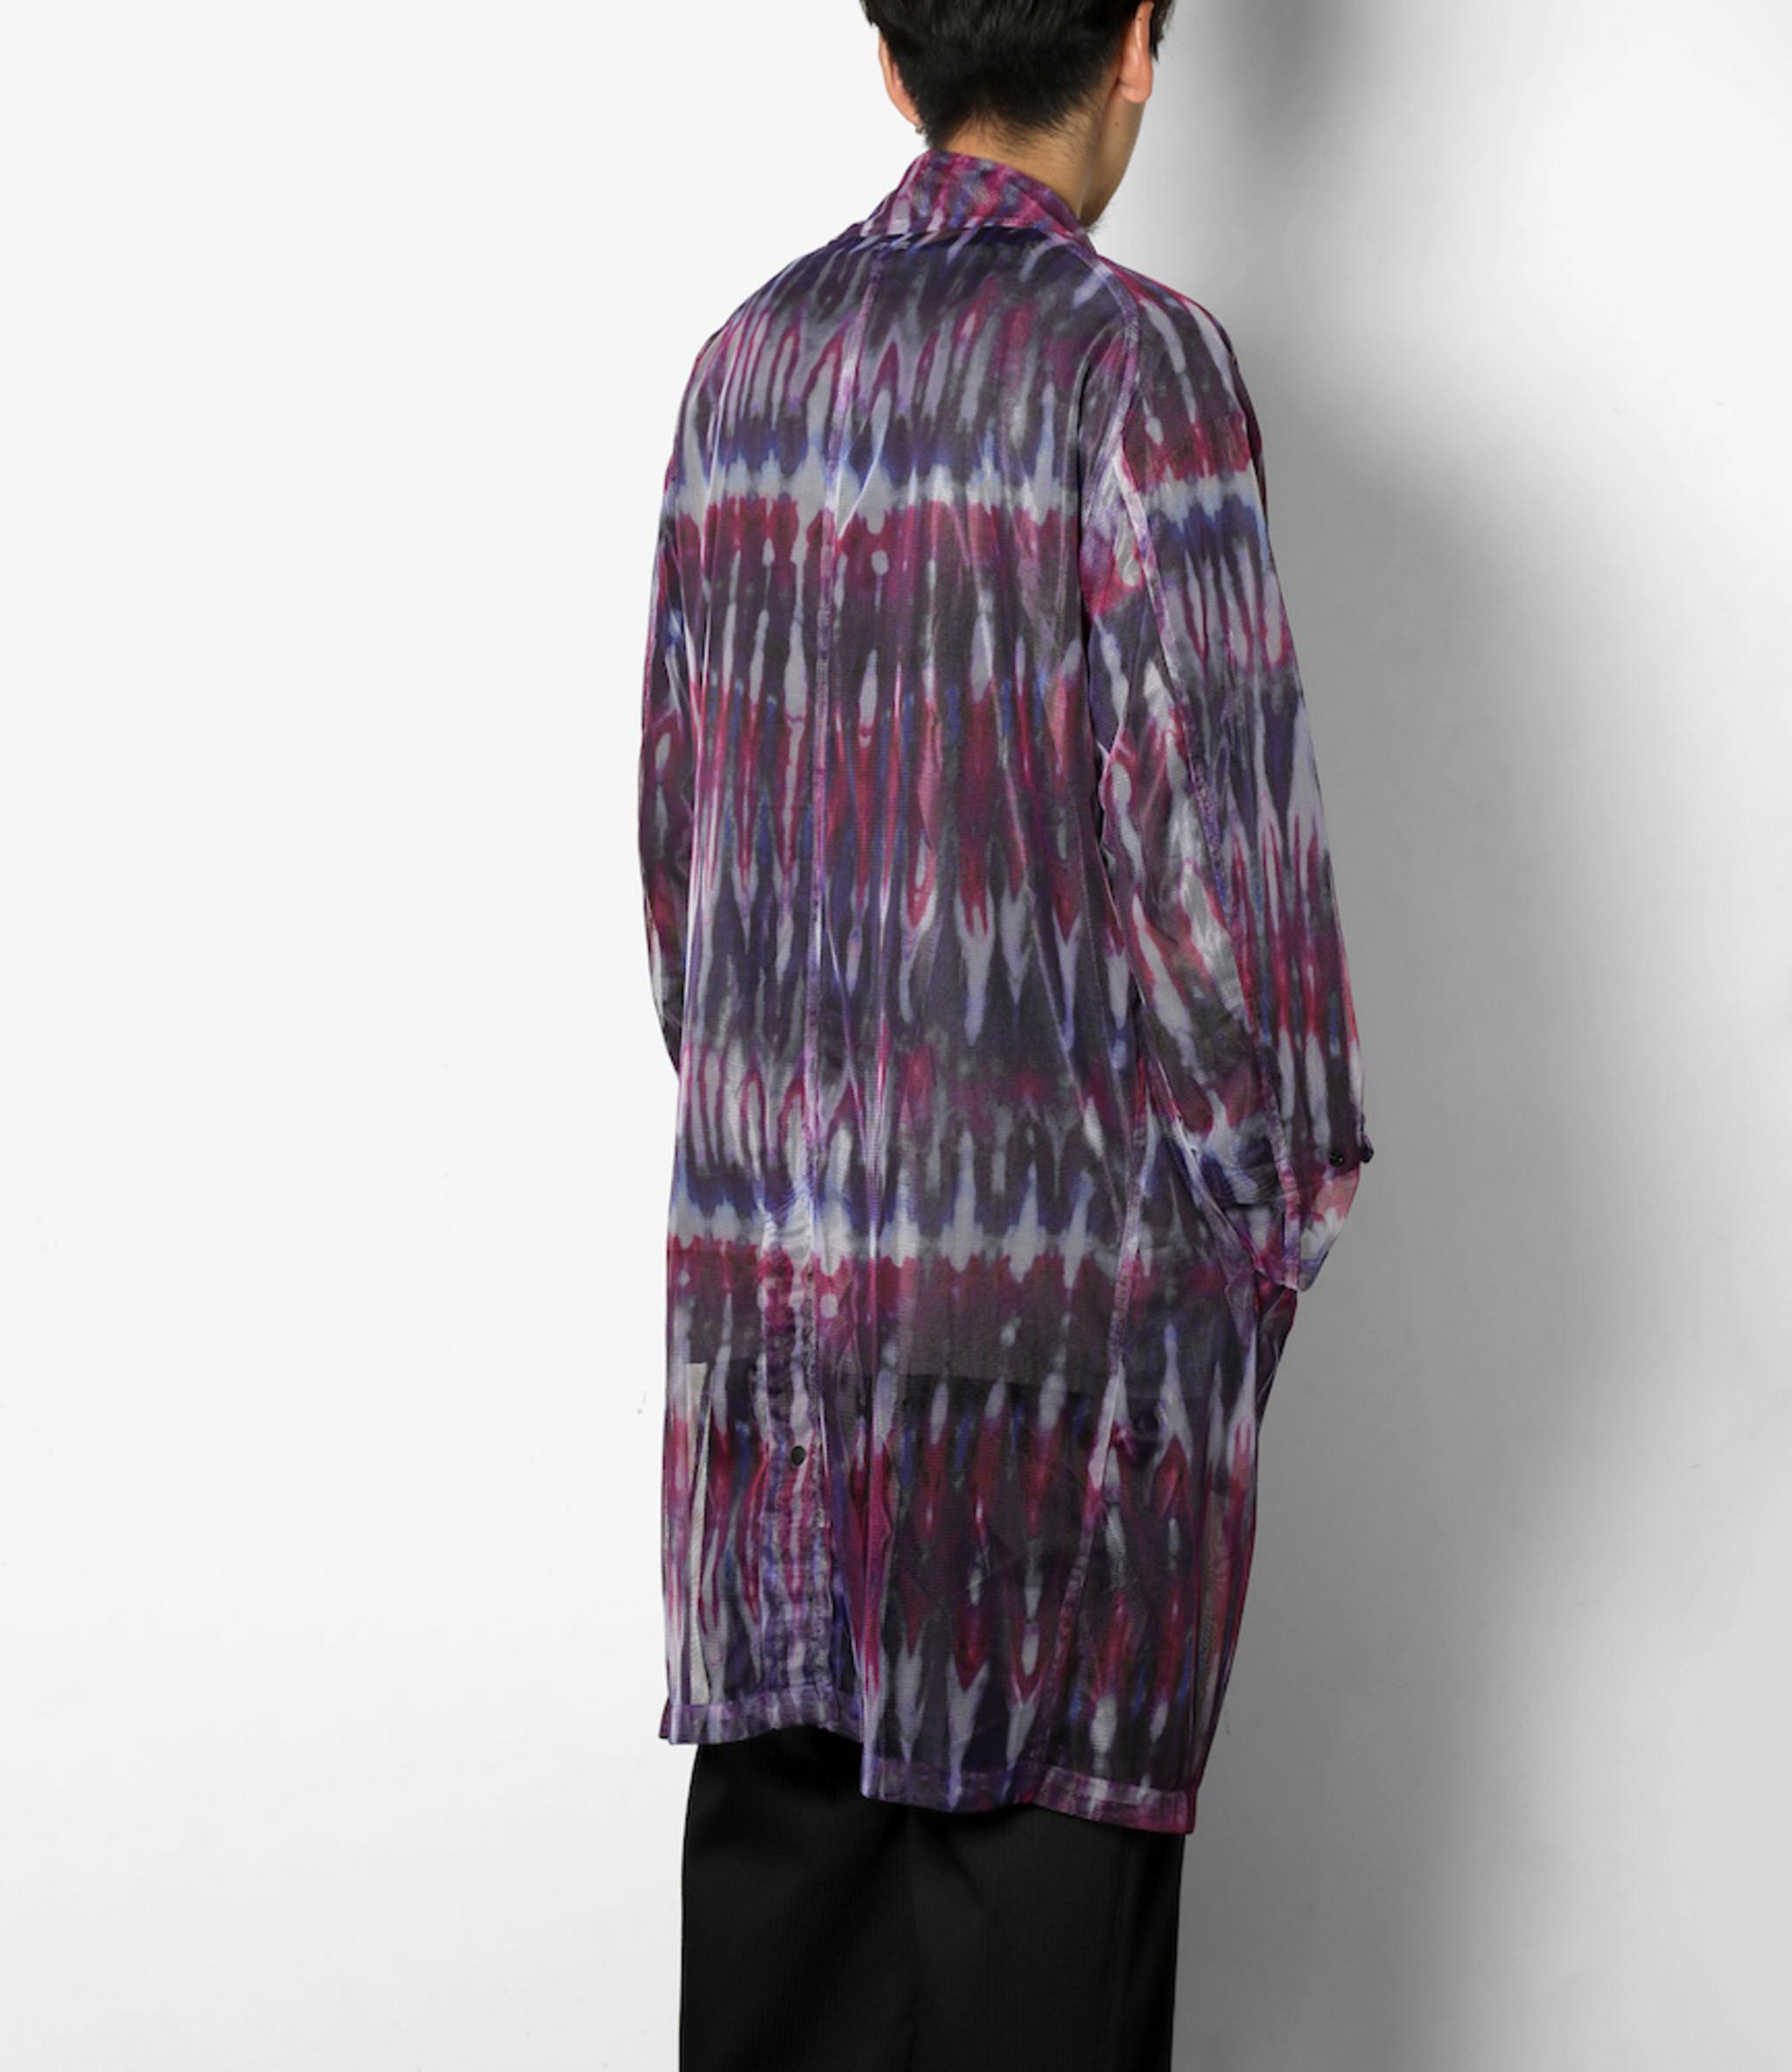 South2 West8 Bush Coat - Poly Lightweight Mesh / Print - Tie Dye